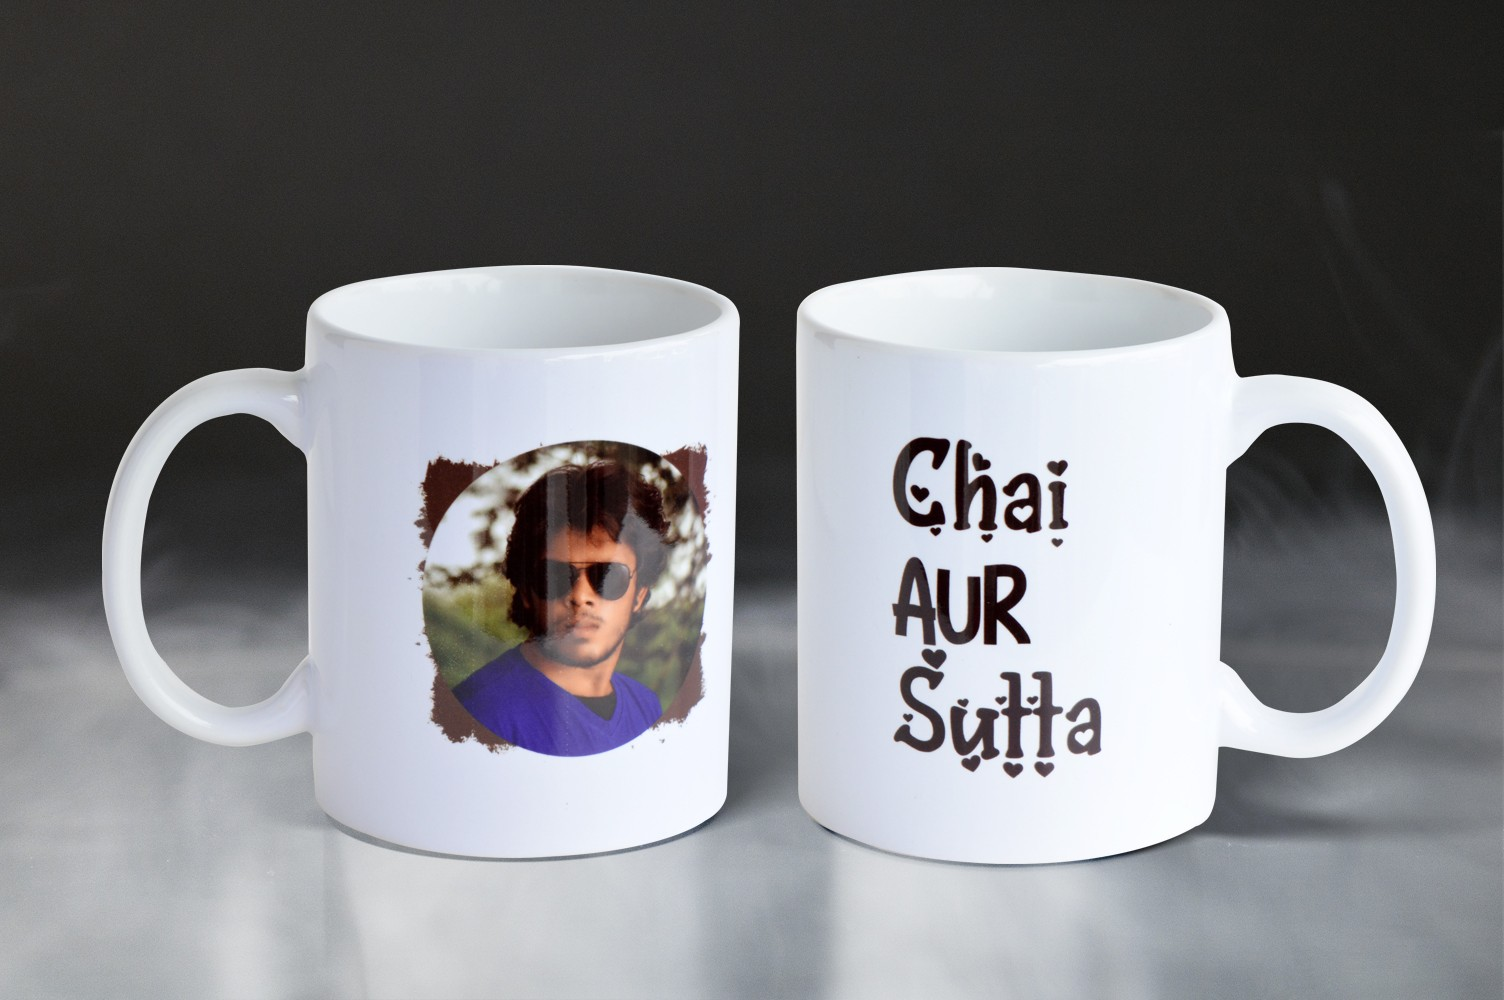 Chai Aur Sutta Personalised Mug